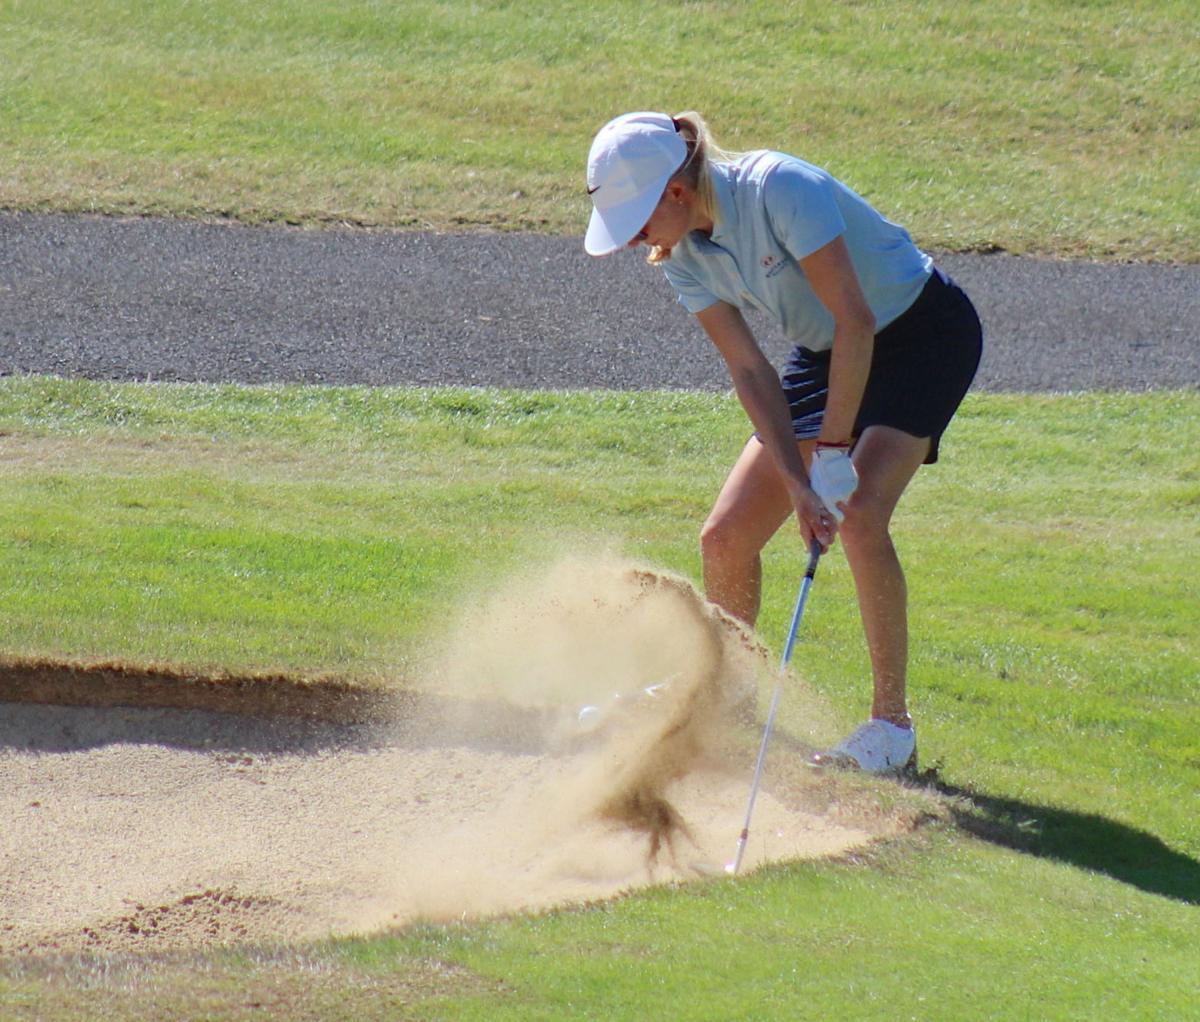 Gretchen Johnson, golfer